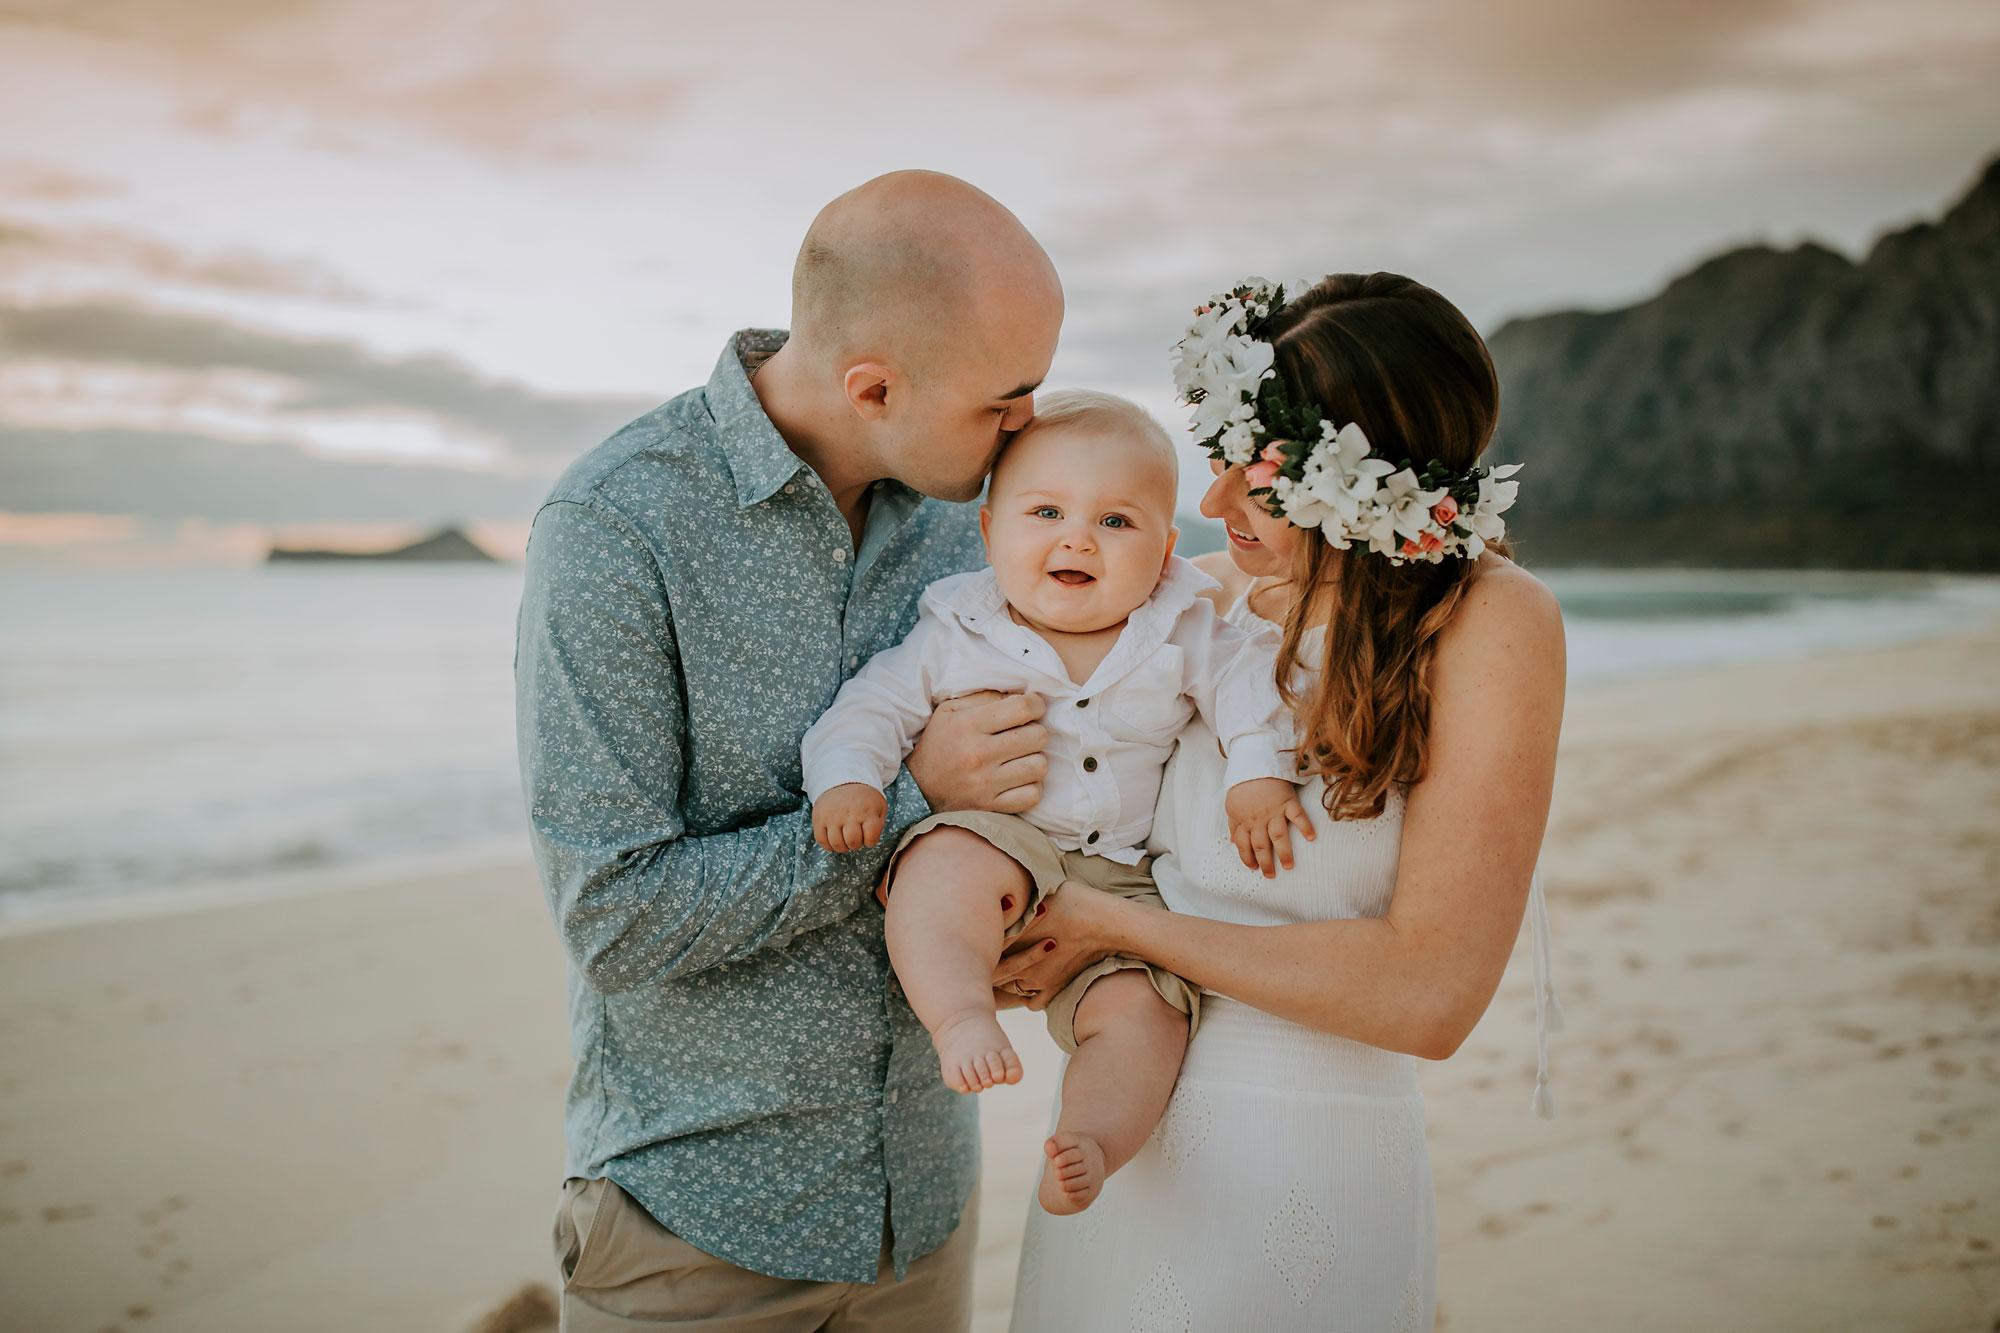 Hawaii-Oahu-Family-Photographer-04.jpg